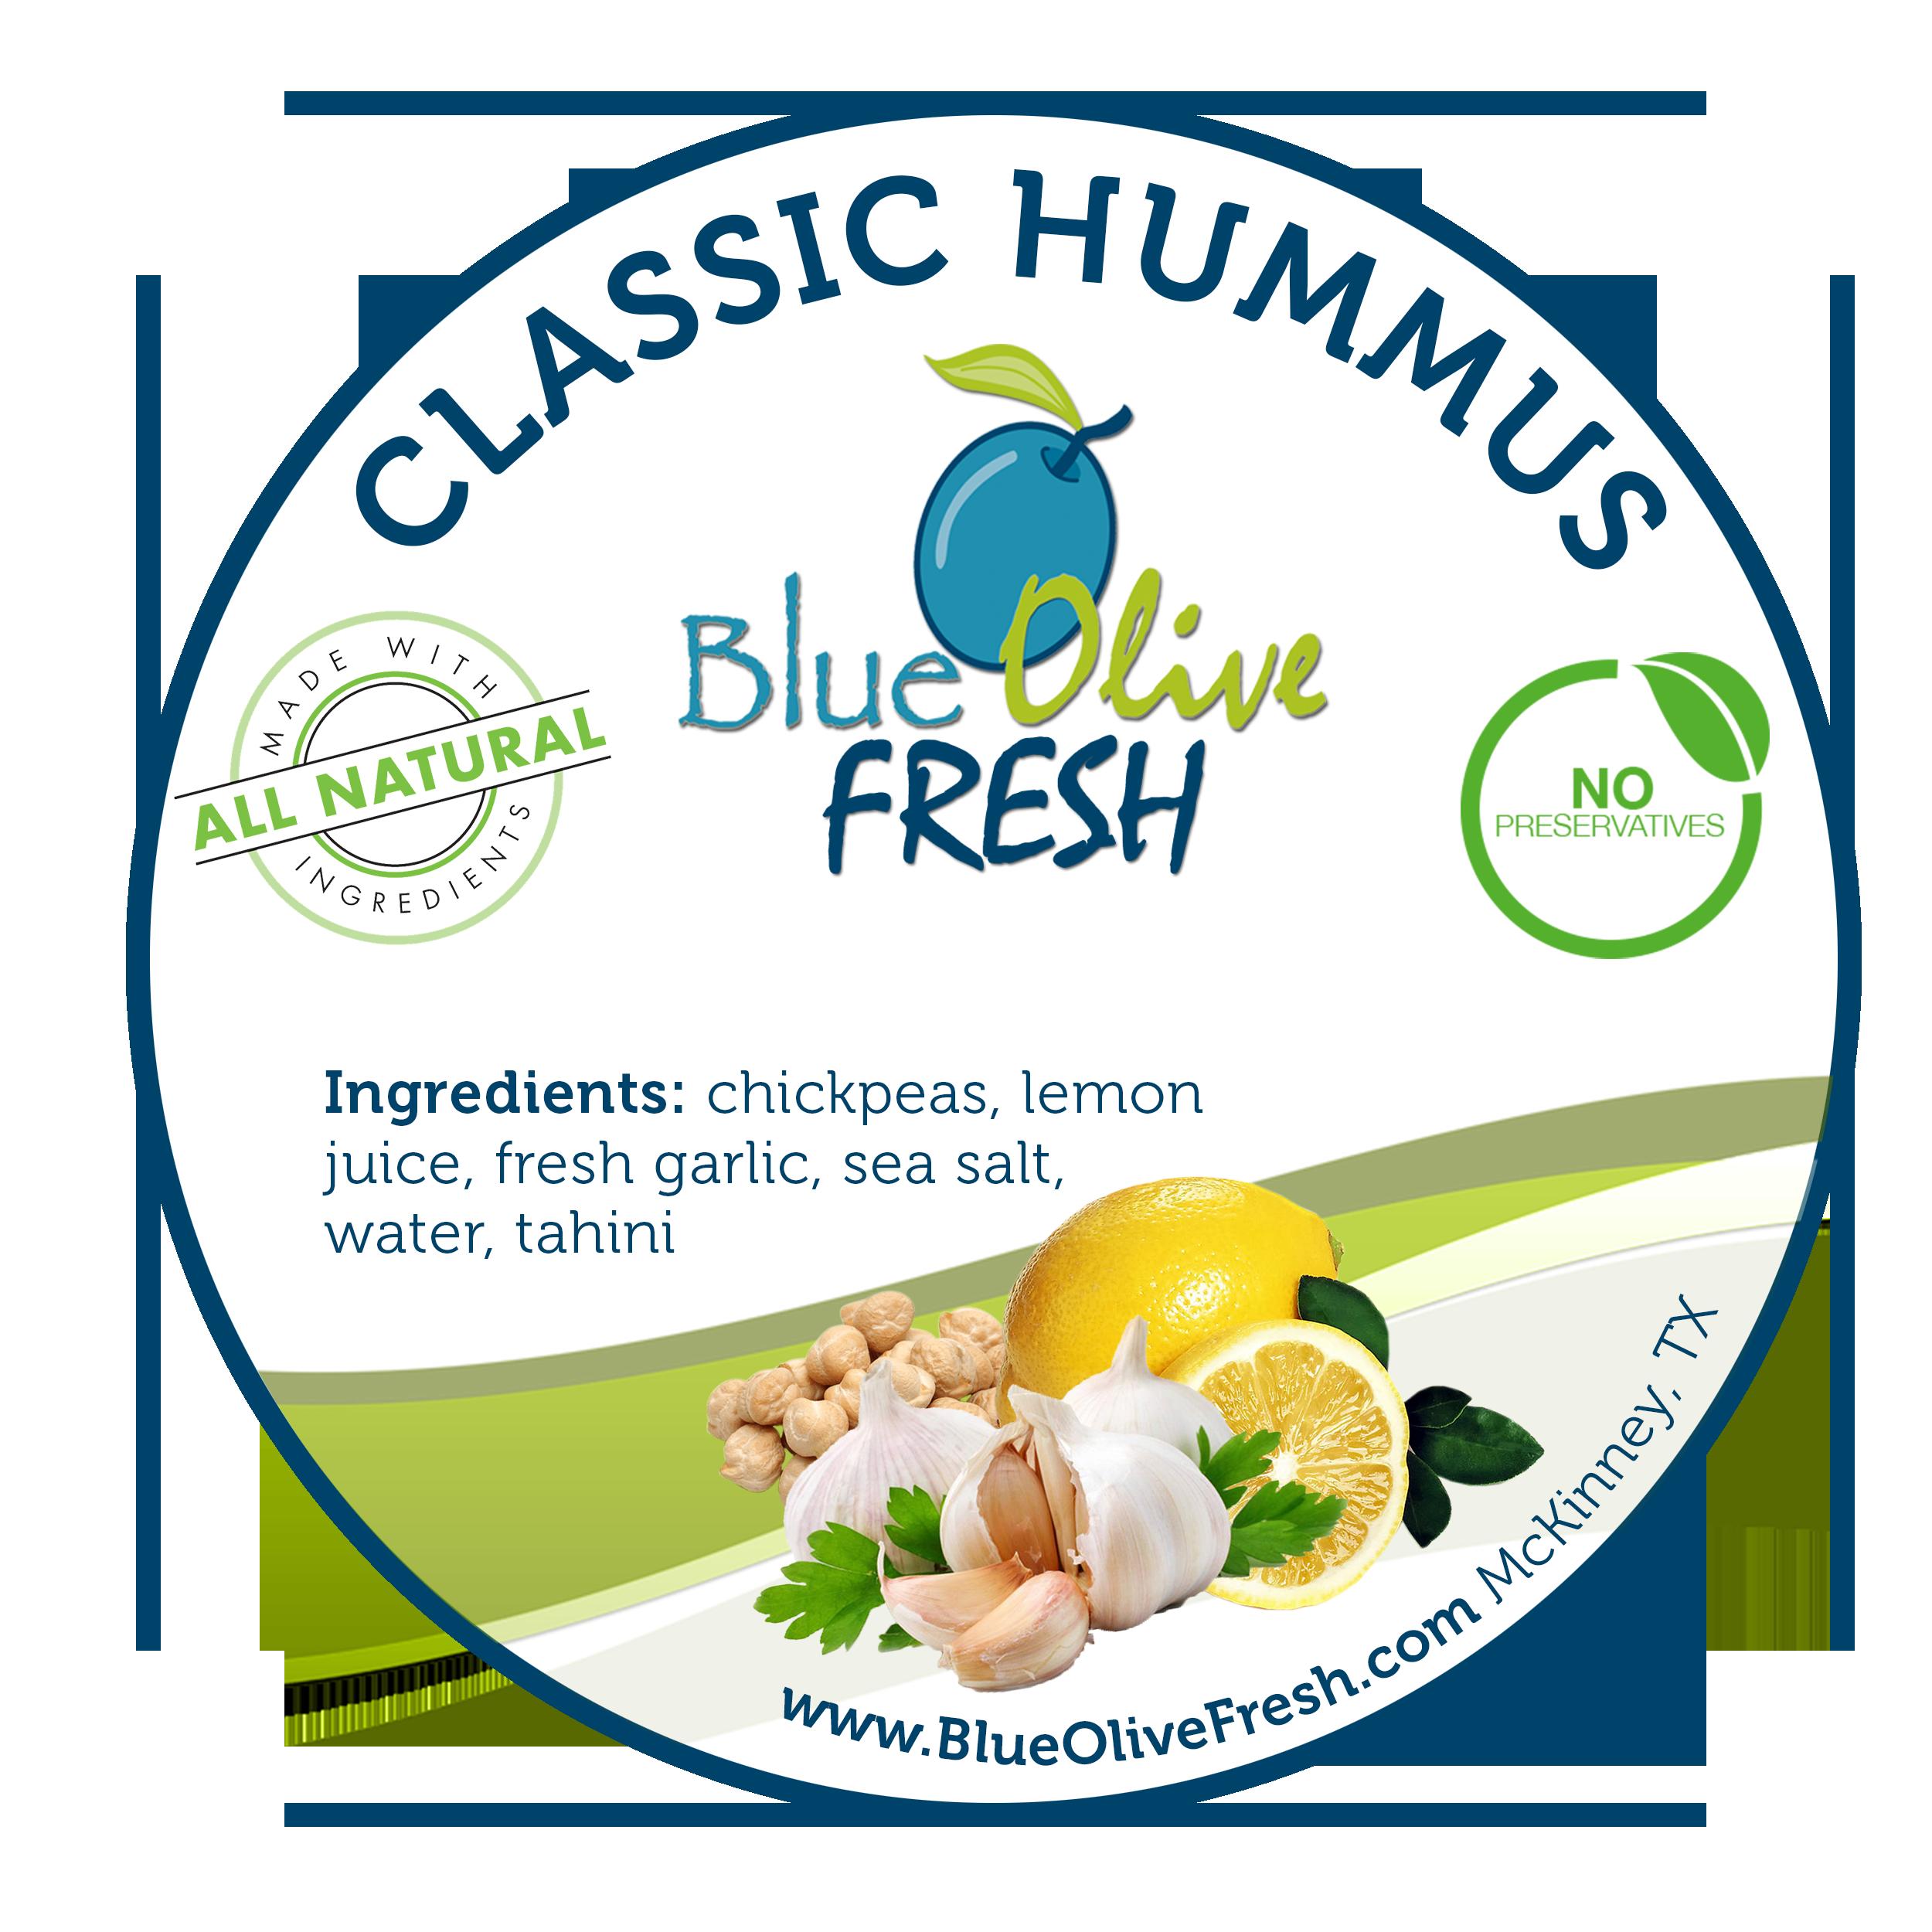 Classic Hummus - 8 oz 00003